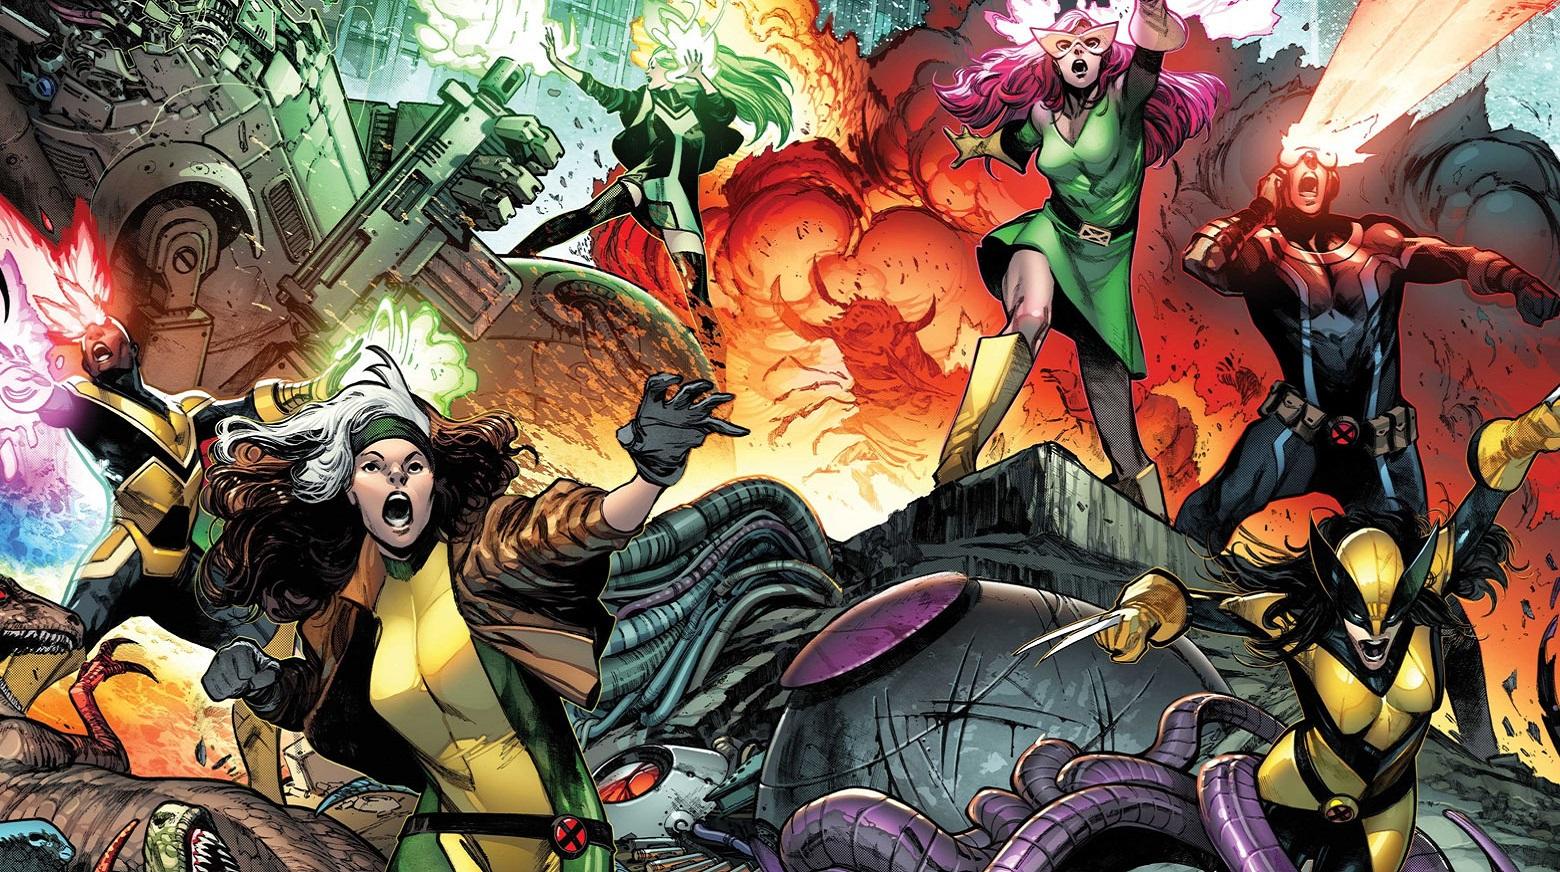 'X-Men' #1